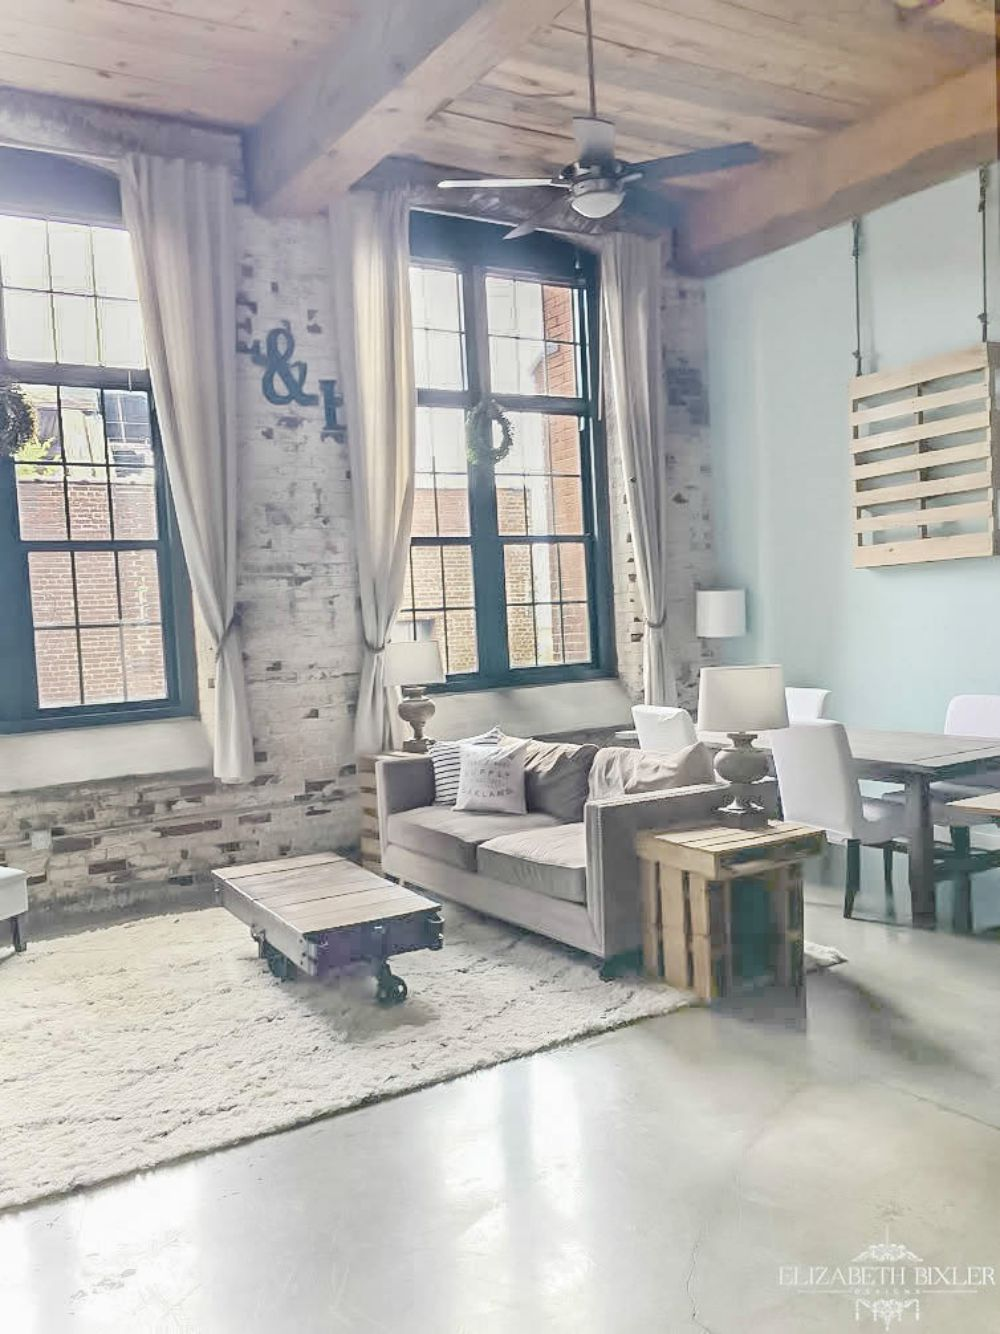 Our Loft Elizabeth Bixler Designs